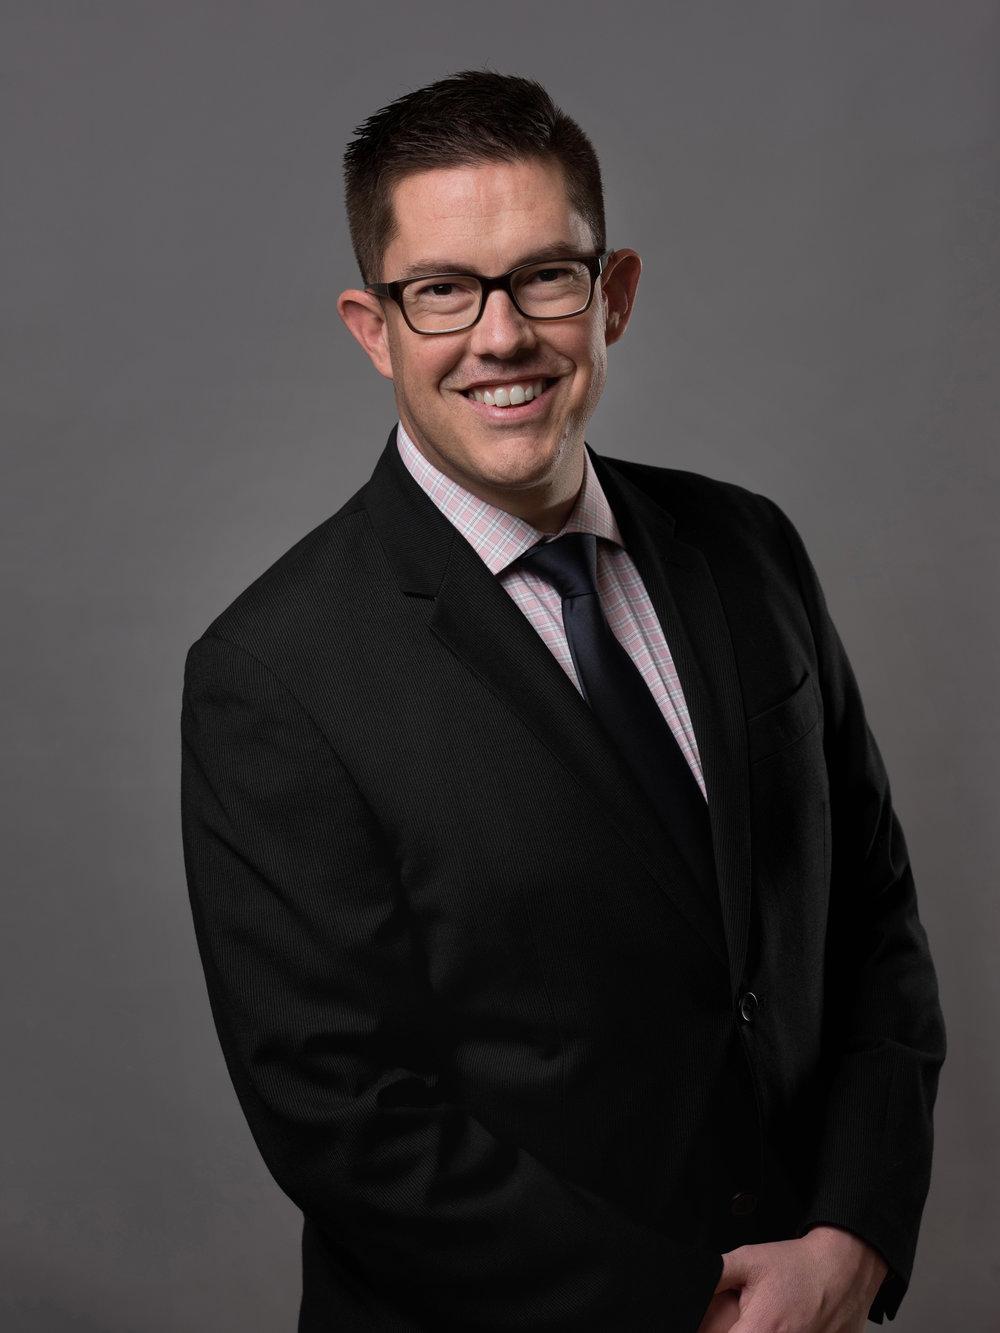 Business portrait of a man using studio light